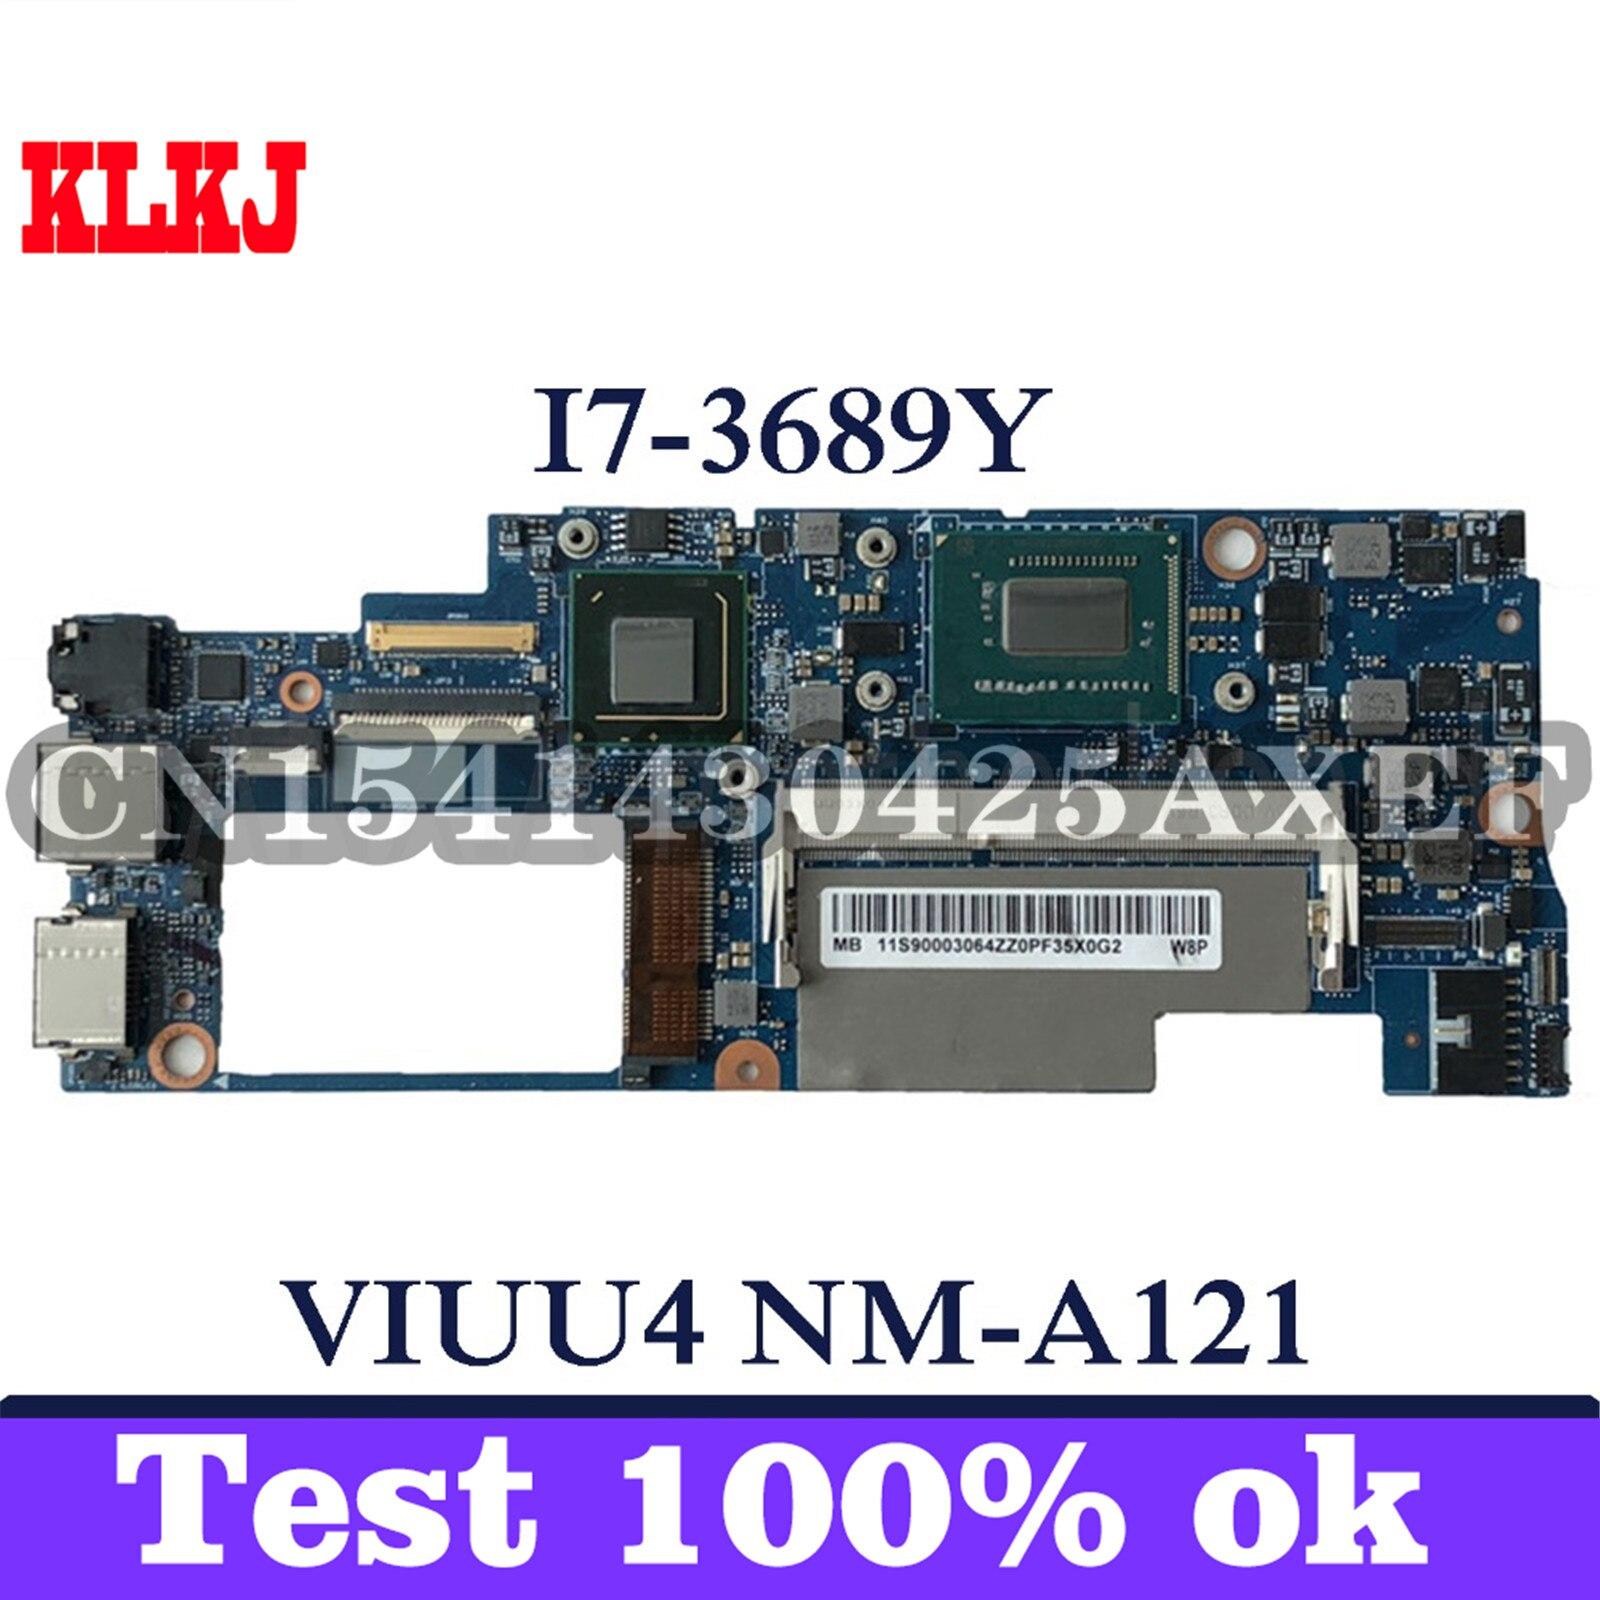 KLKJ VIUU4 NM-A121 اللوحة الأم للكمبيوتر المحمول لينوفو اليوغا 11S اختبار اللوحة الرئيسية الأصلية I7-3689Y